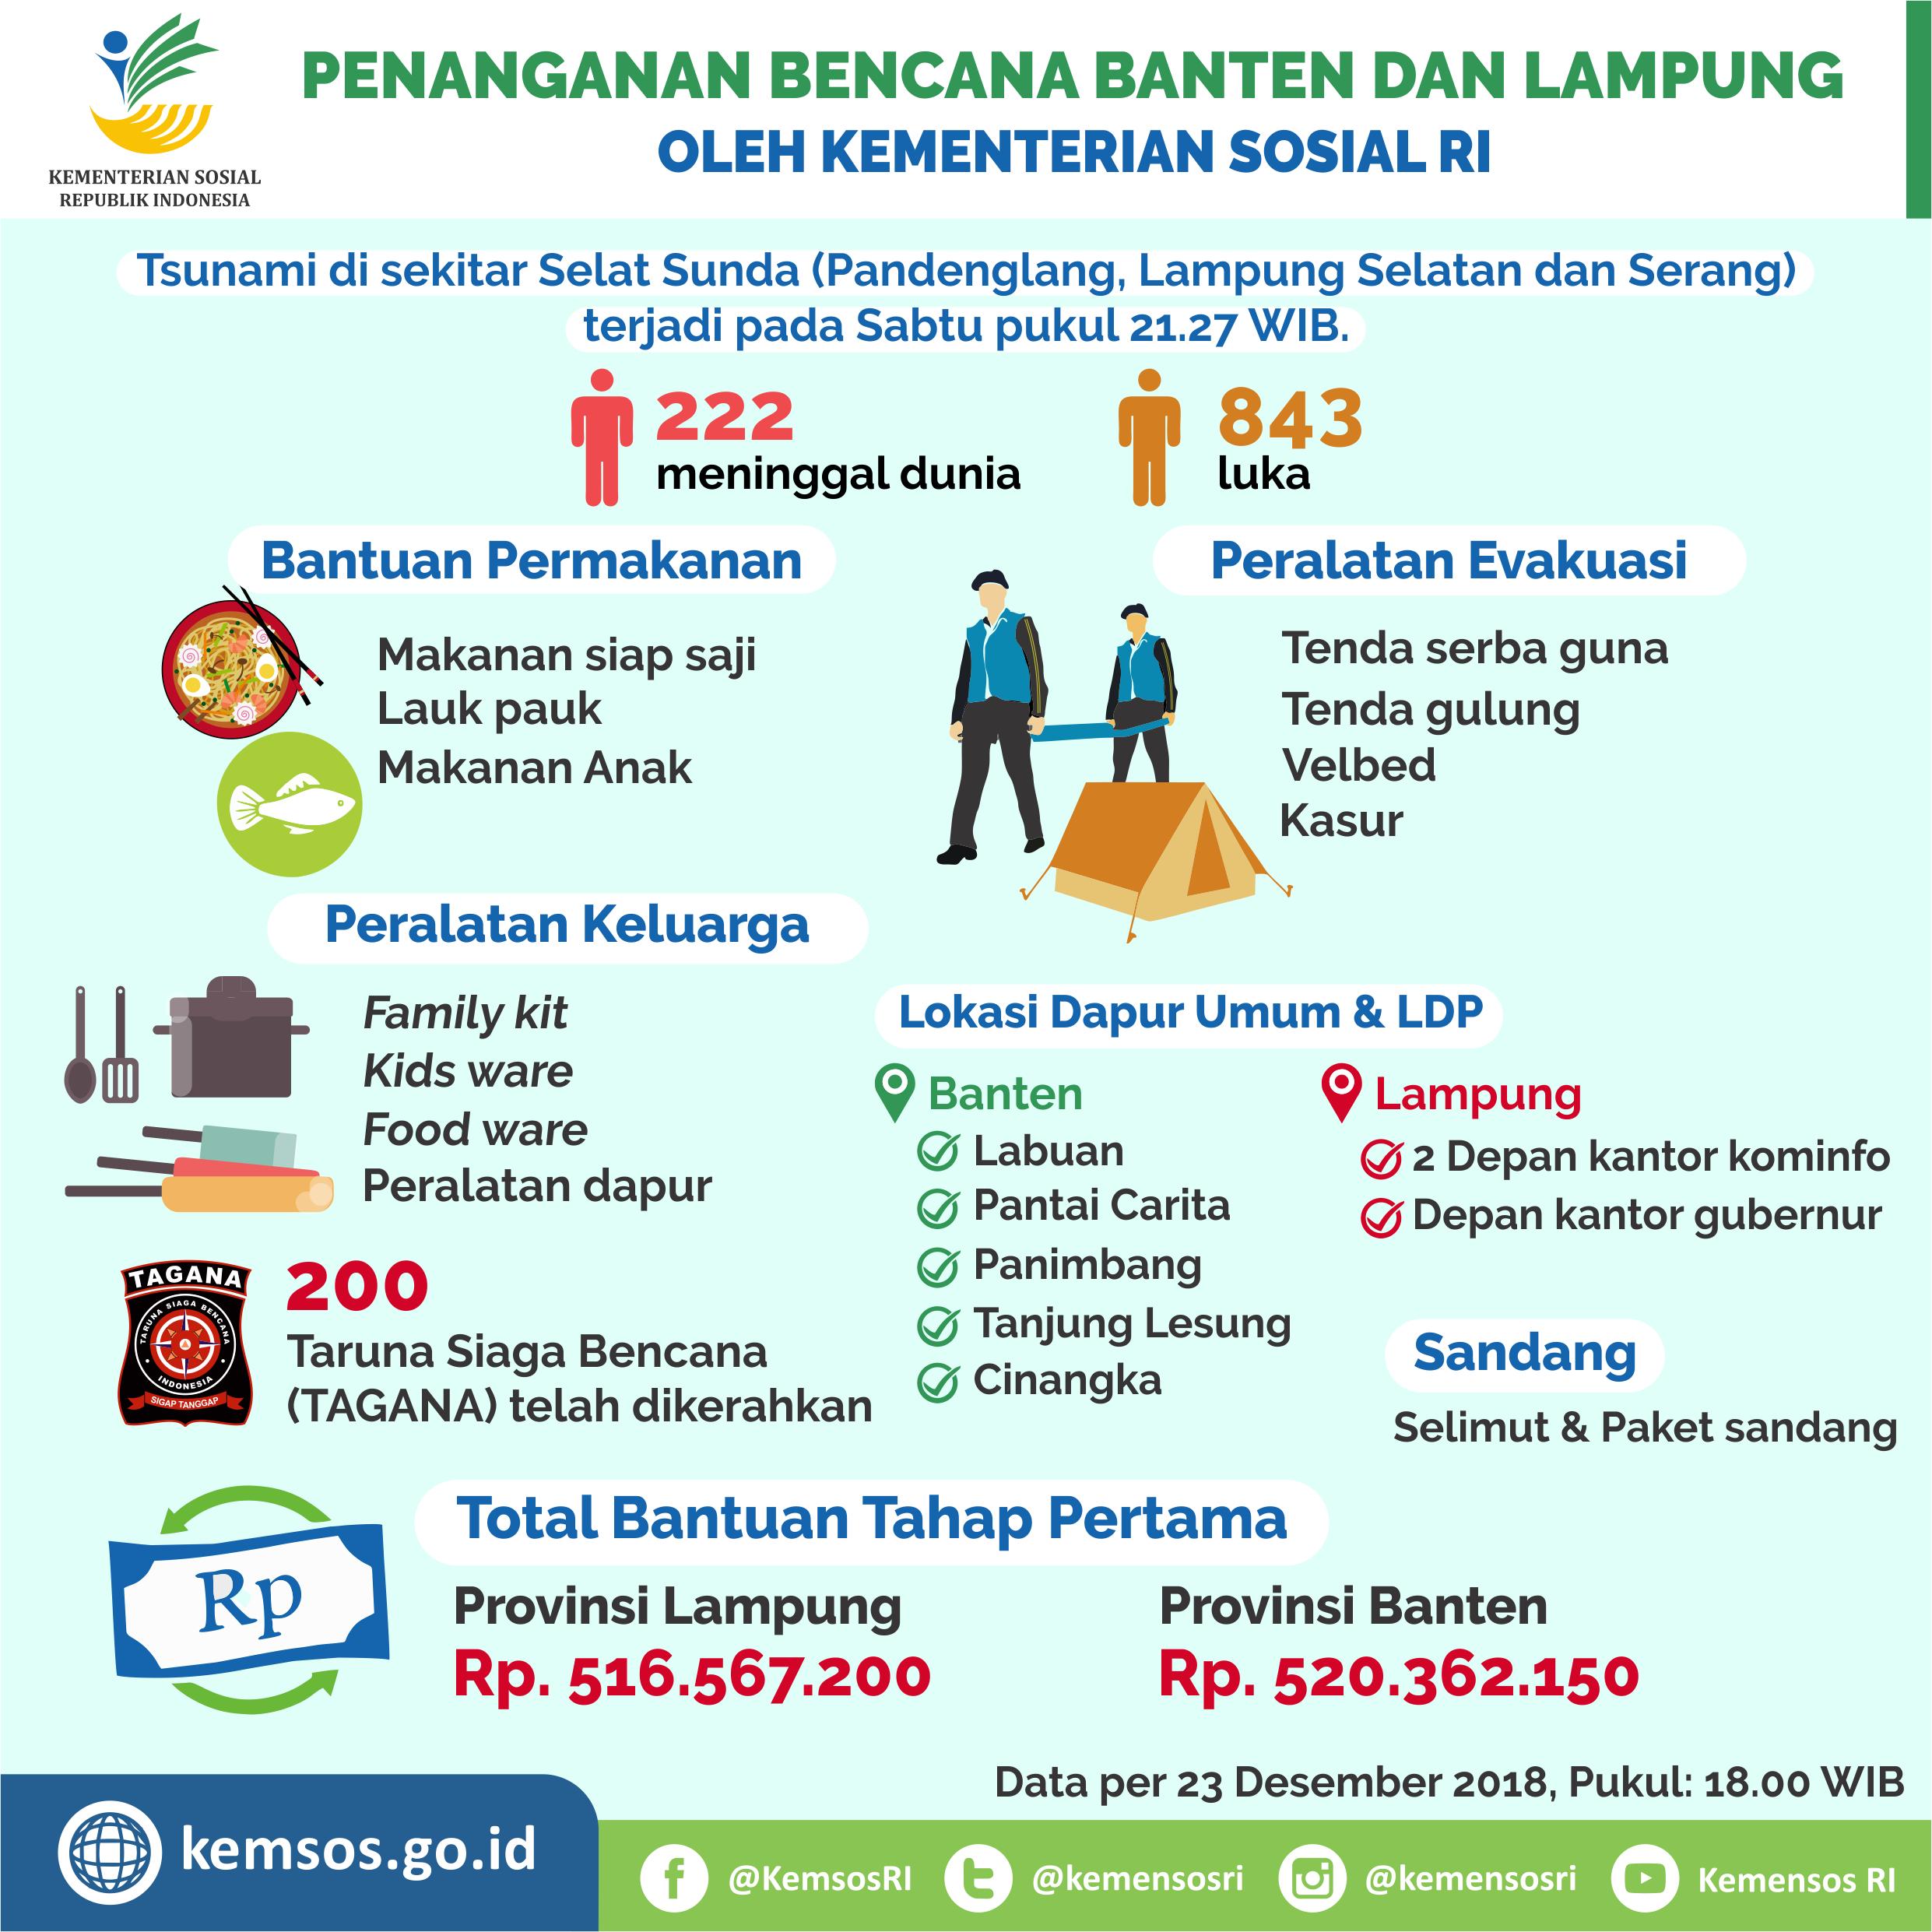 Penanganan Bencana Banten dan Lampung